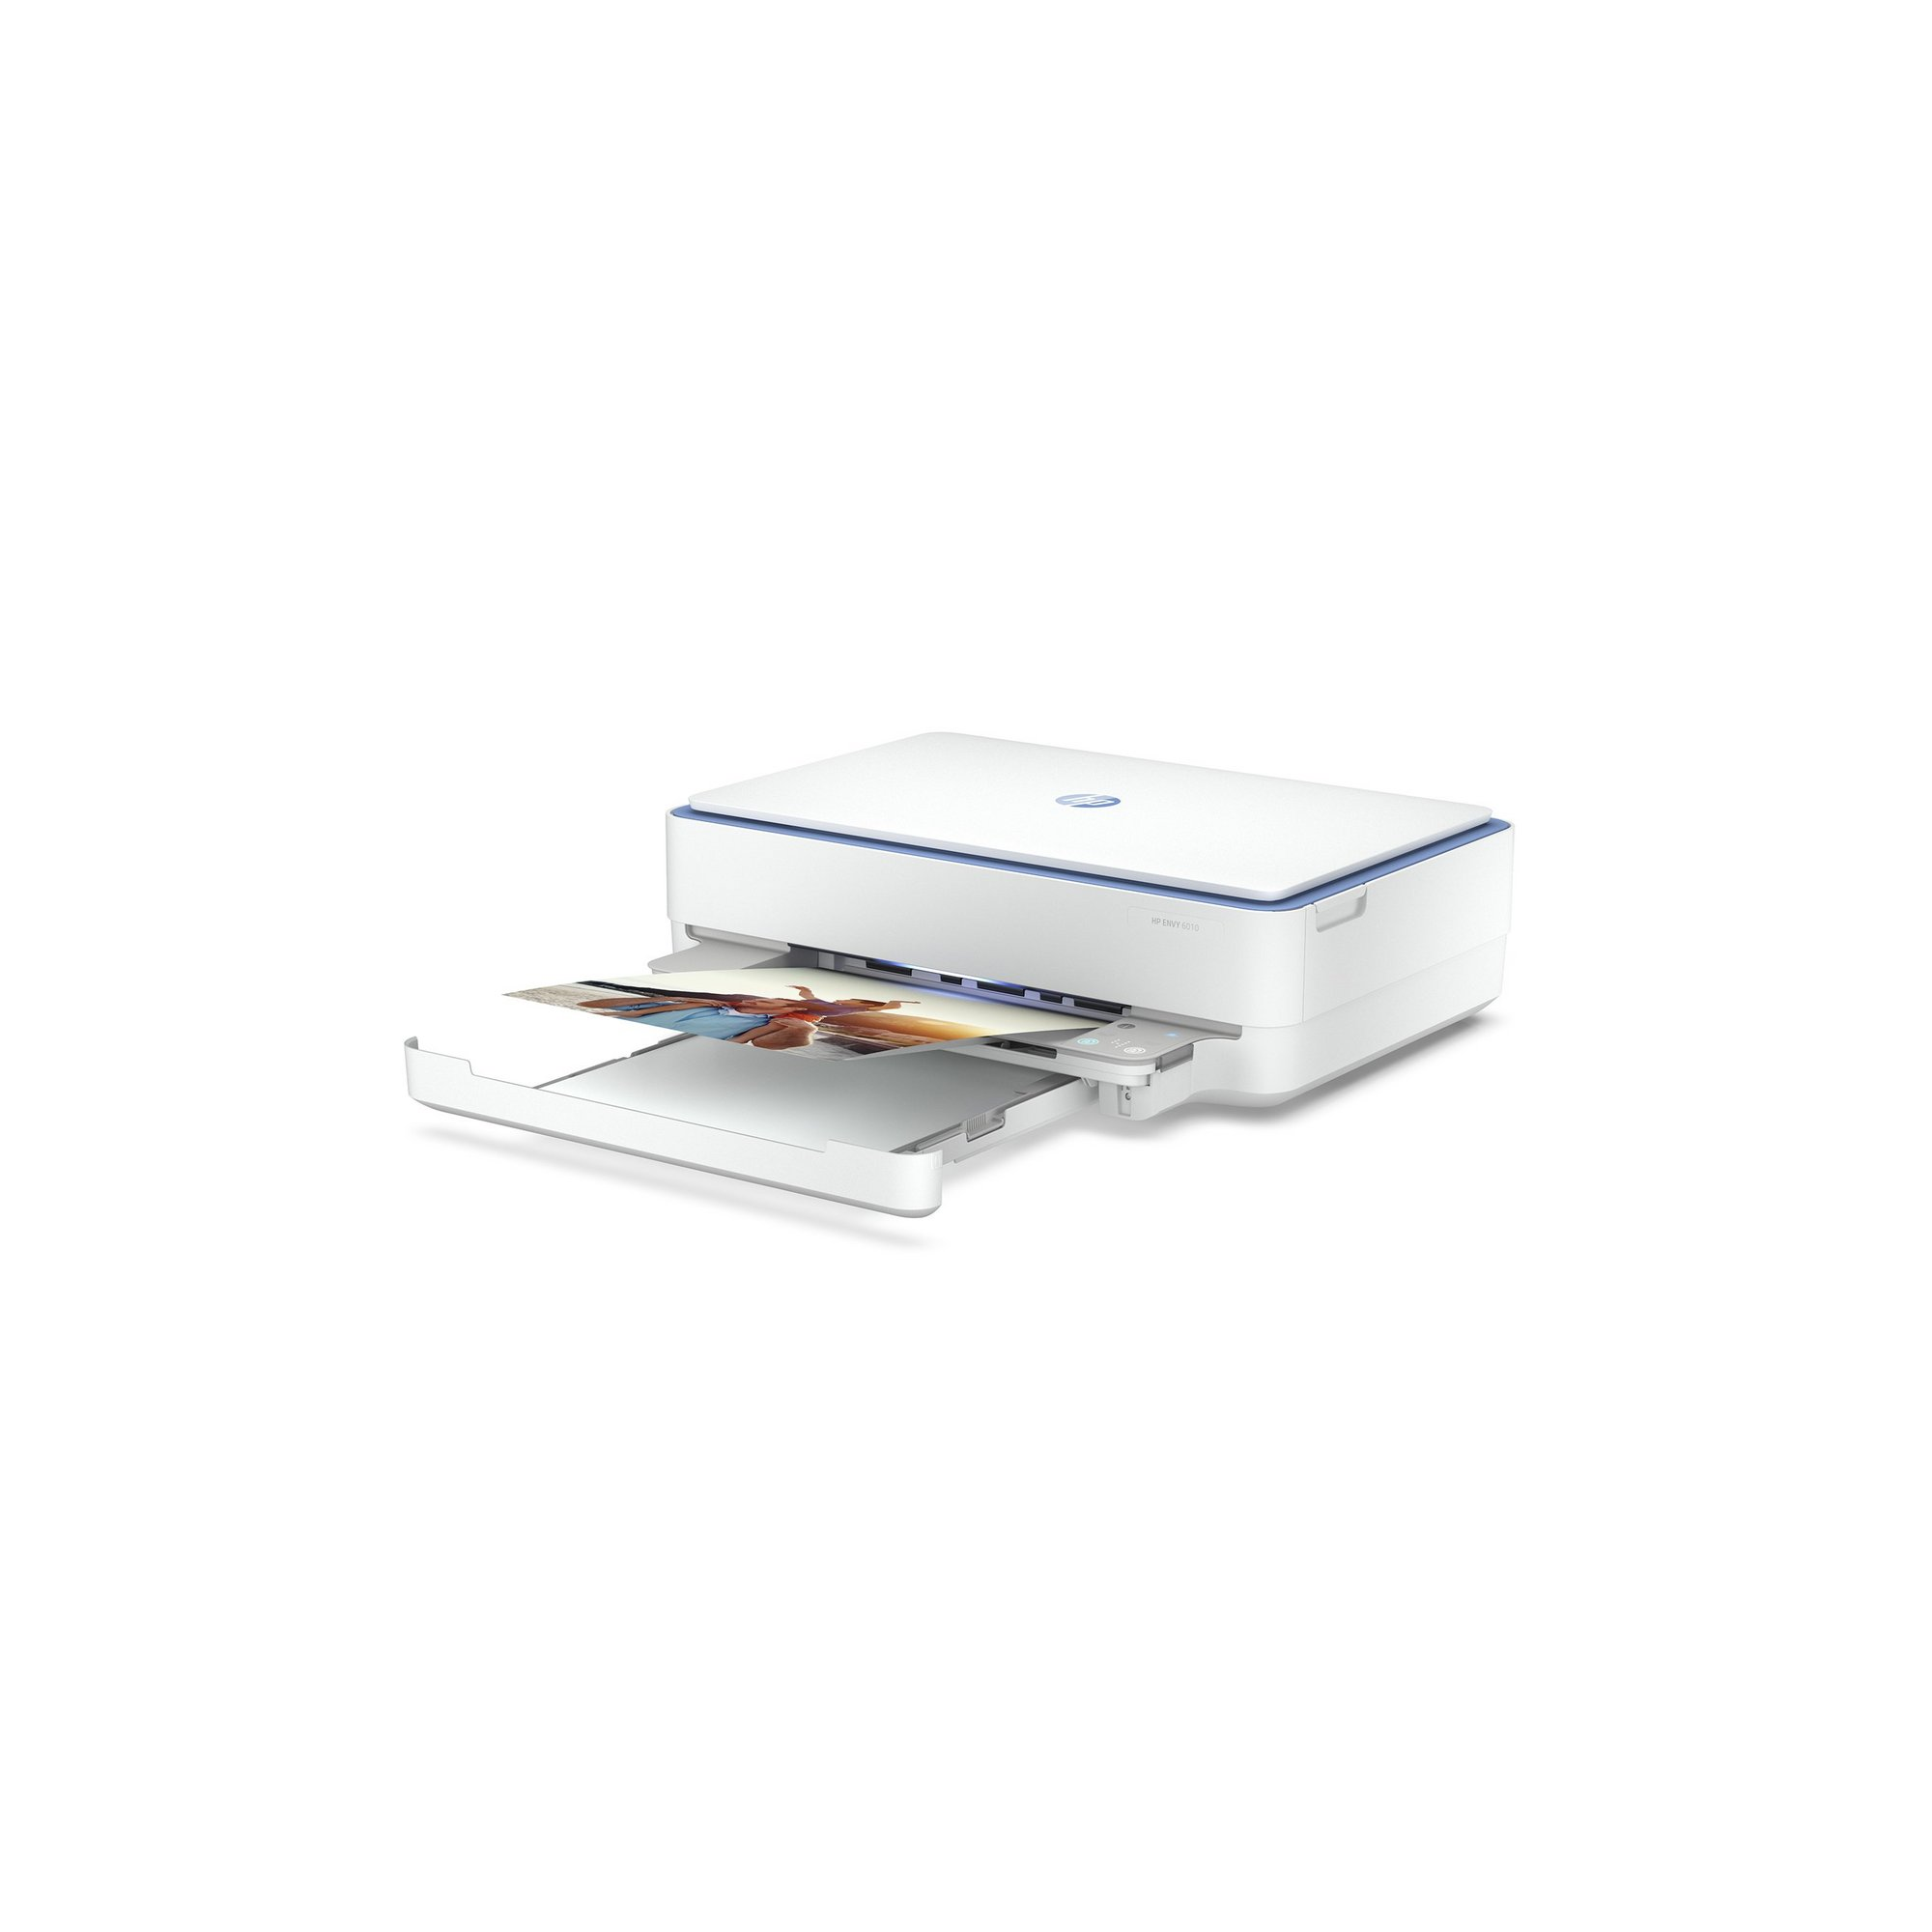 Image of HP ENVY 6010 All-in-One Wireless Inkjet Printer